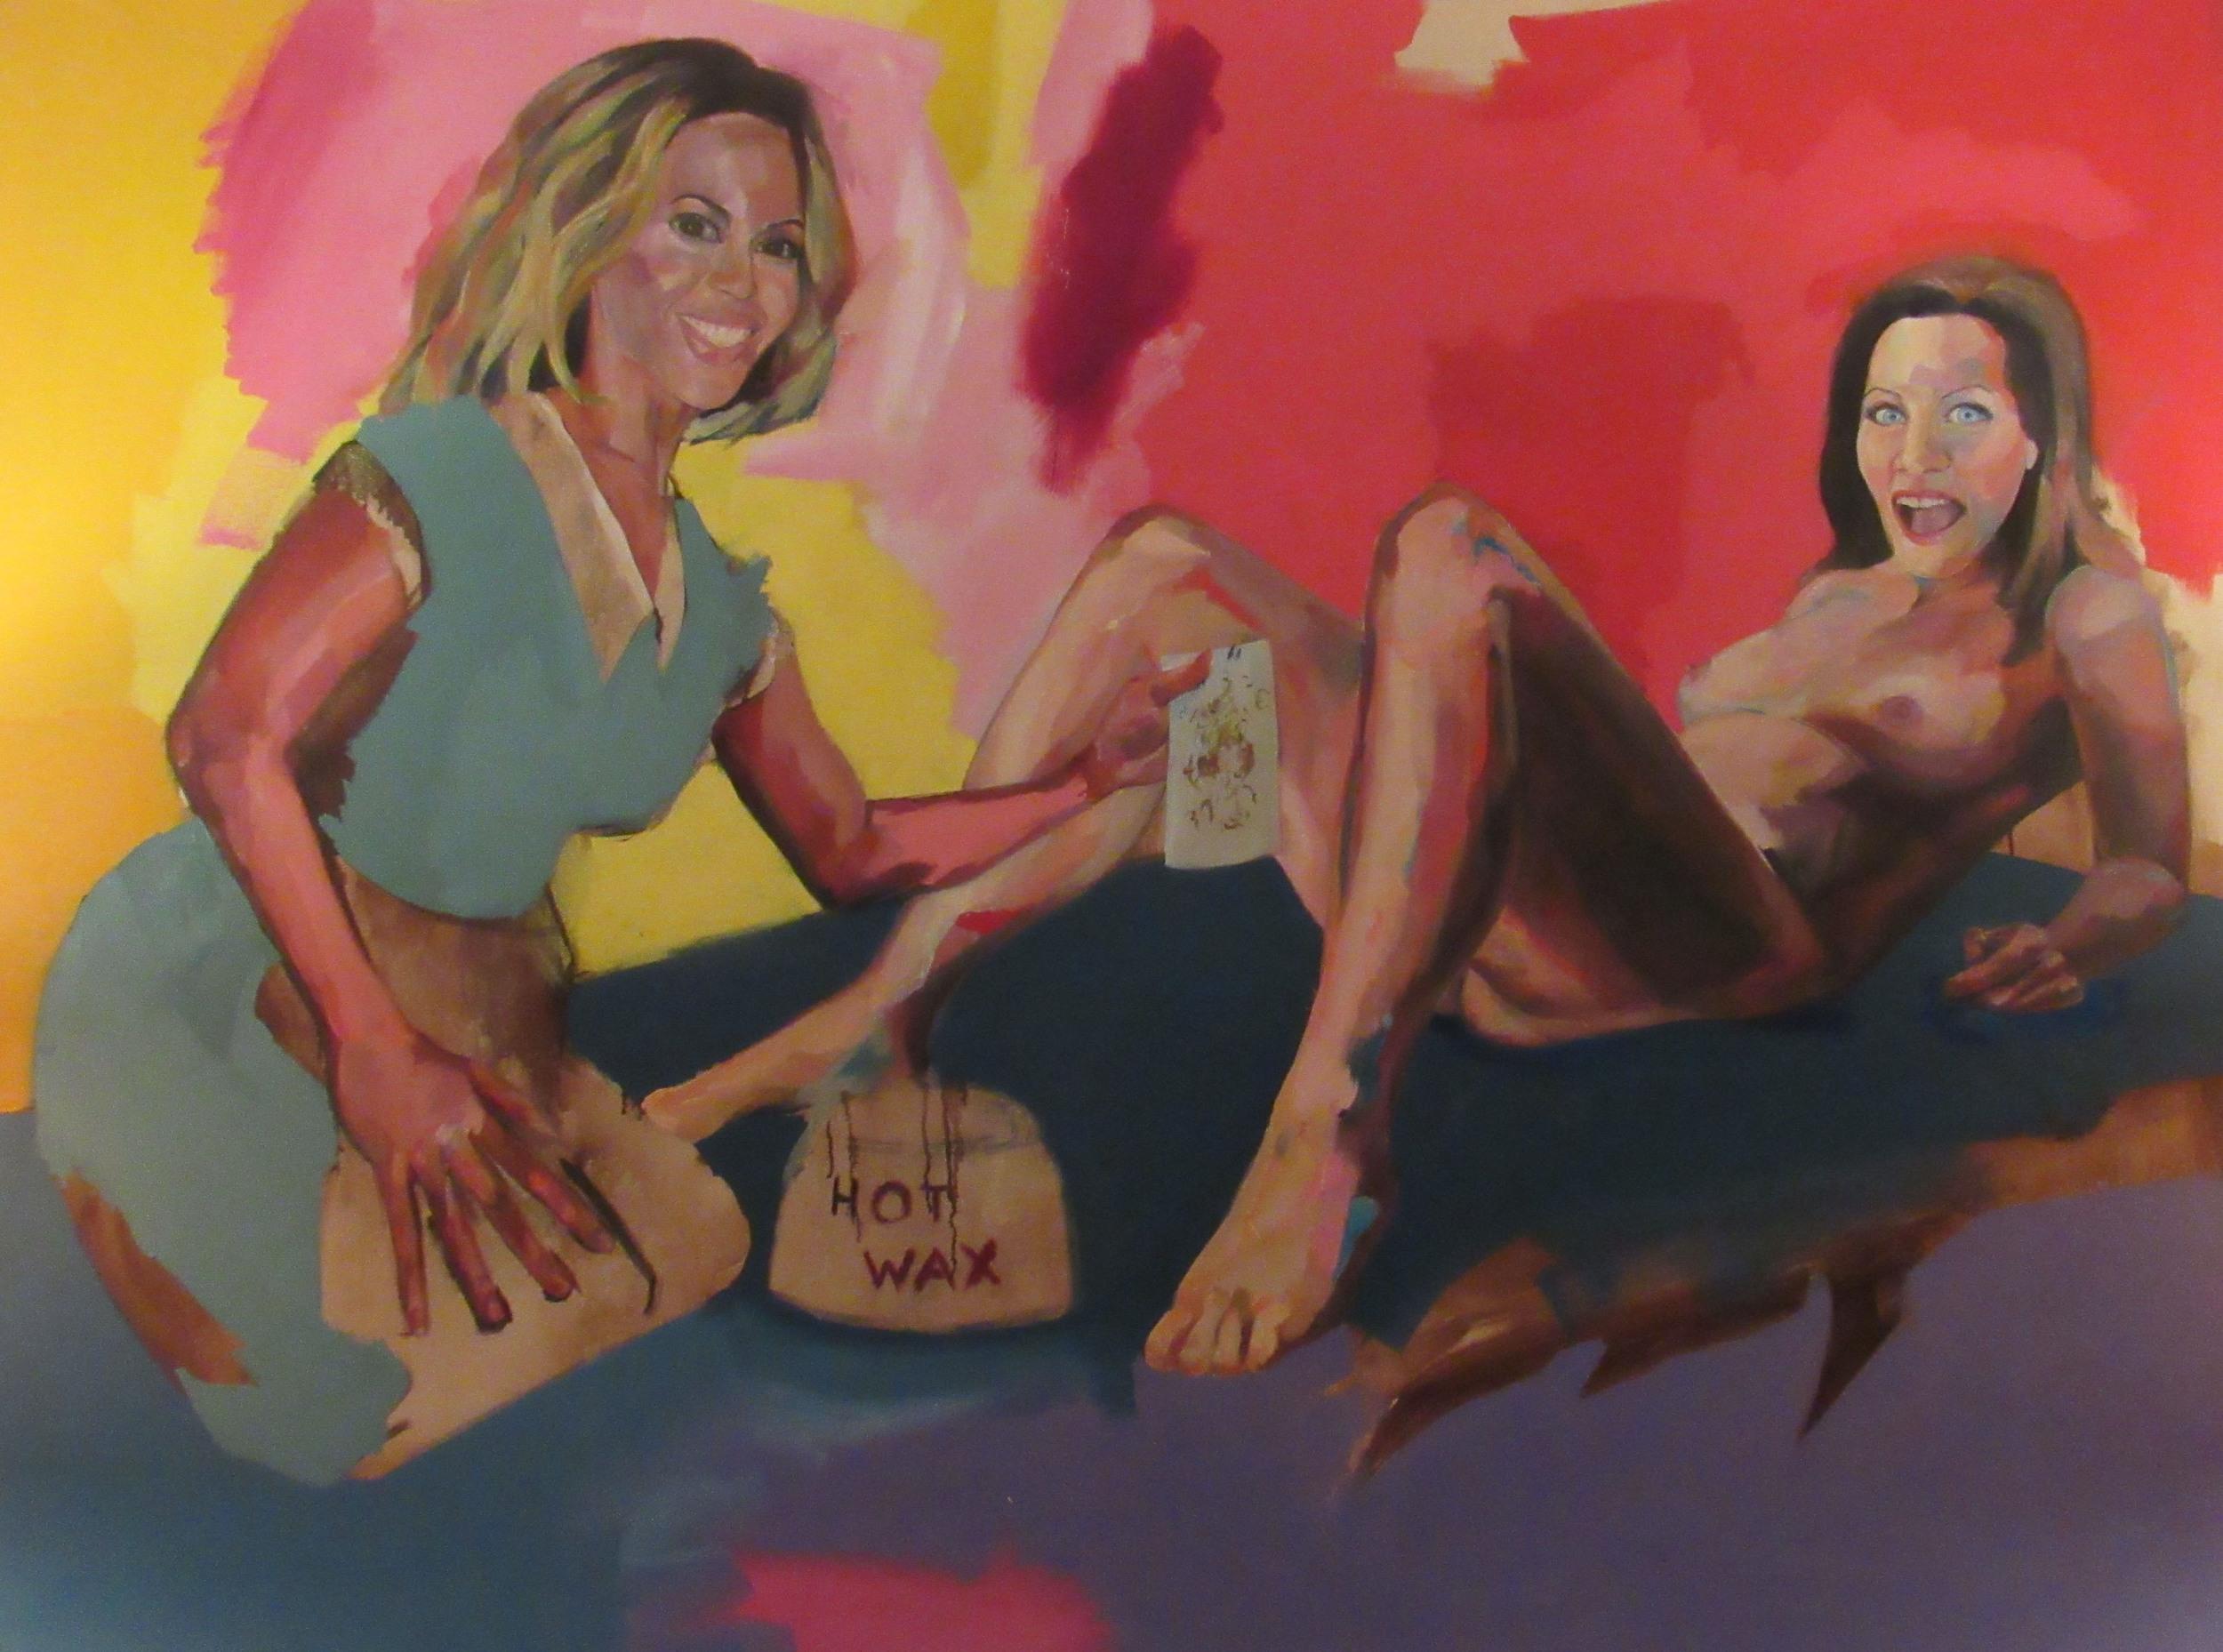 Brazilian Maids: Hot Wax (Empregadas Brasileiras: Cera Quente)